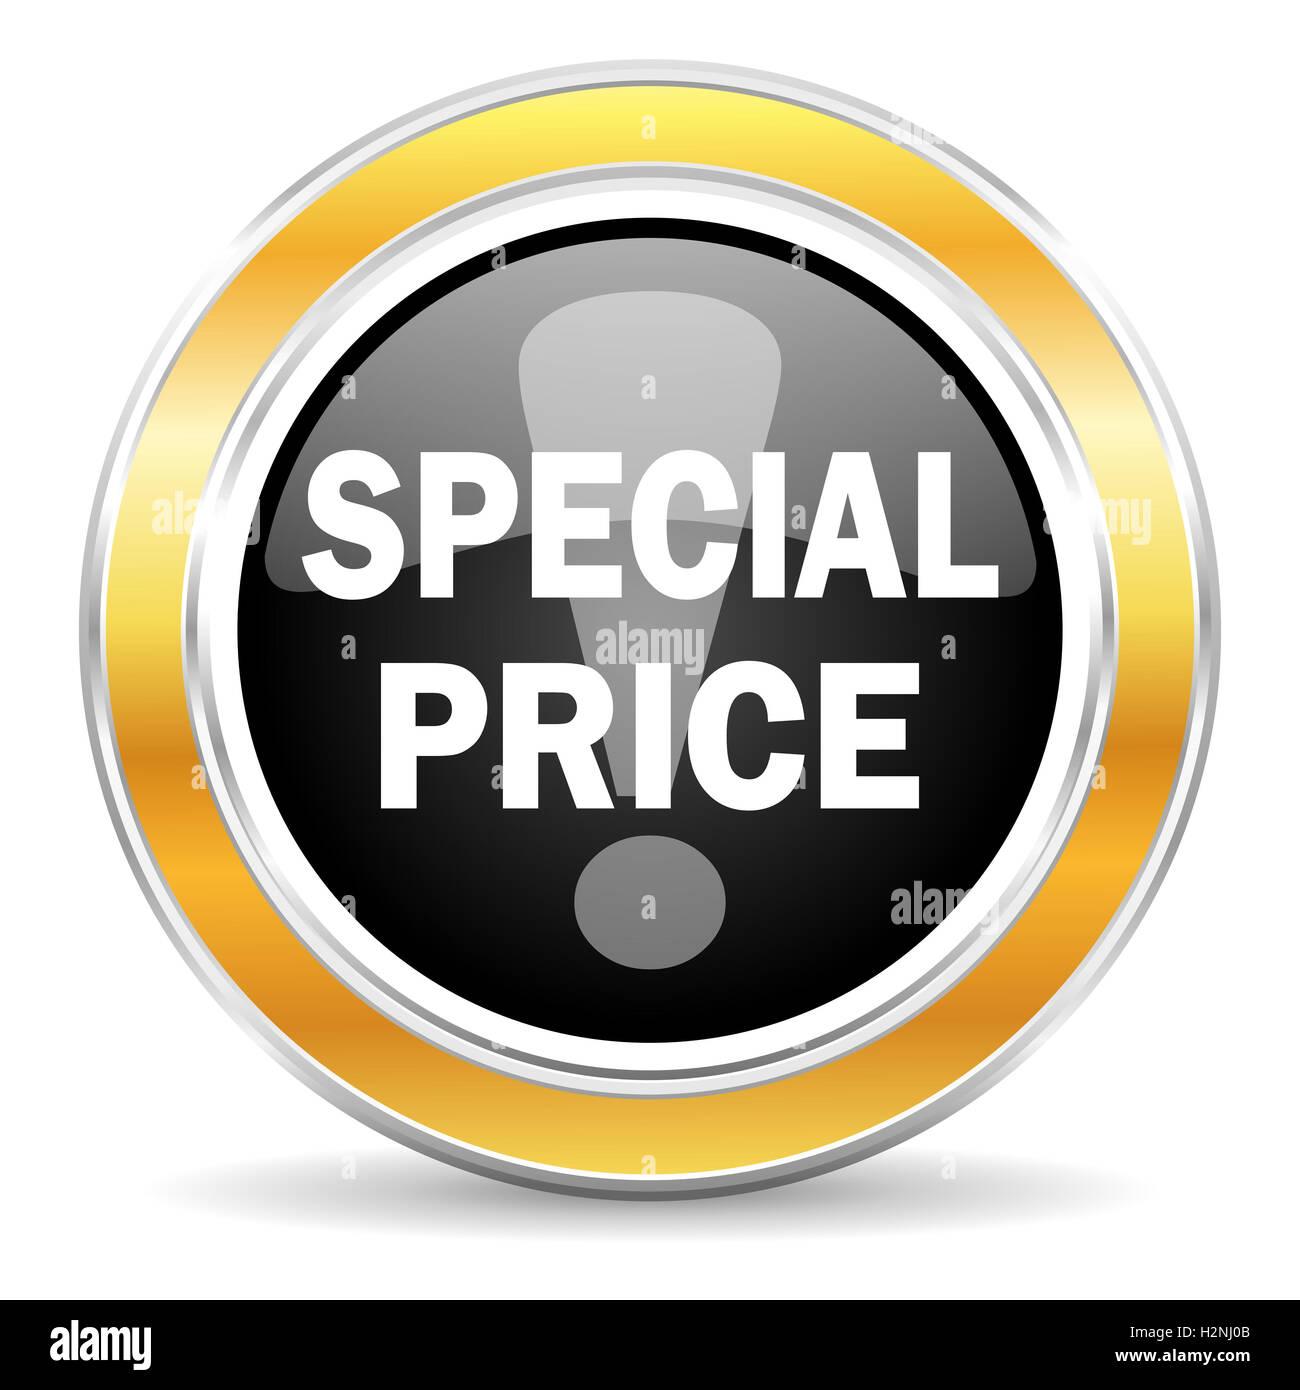 Special Price Pagina 1